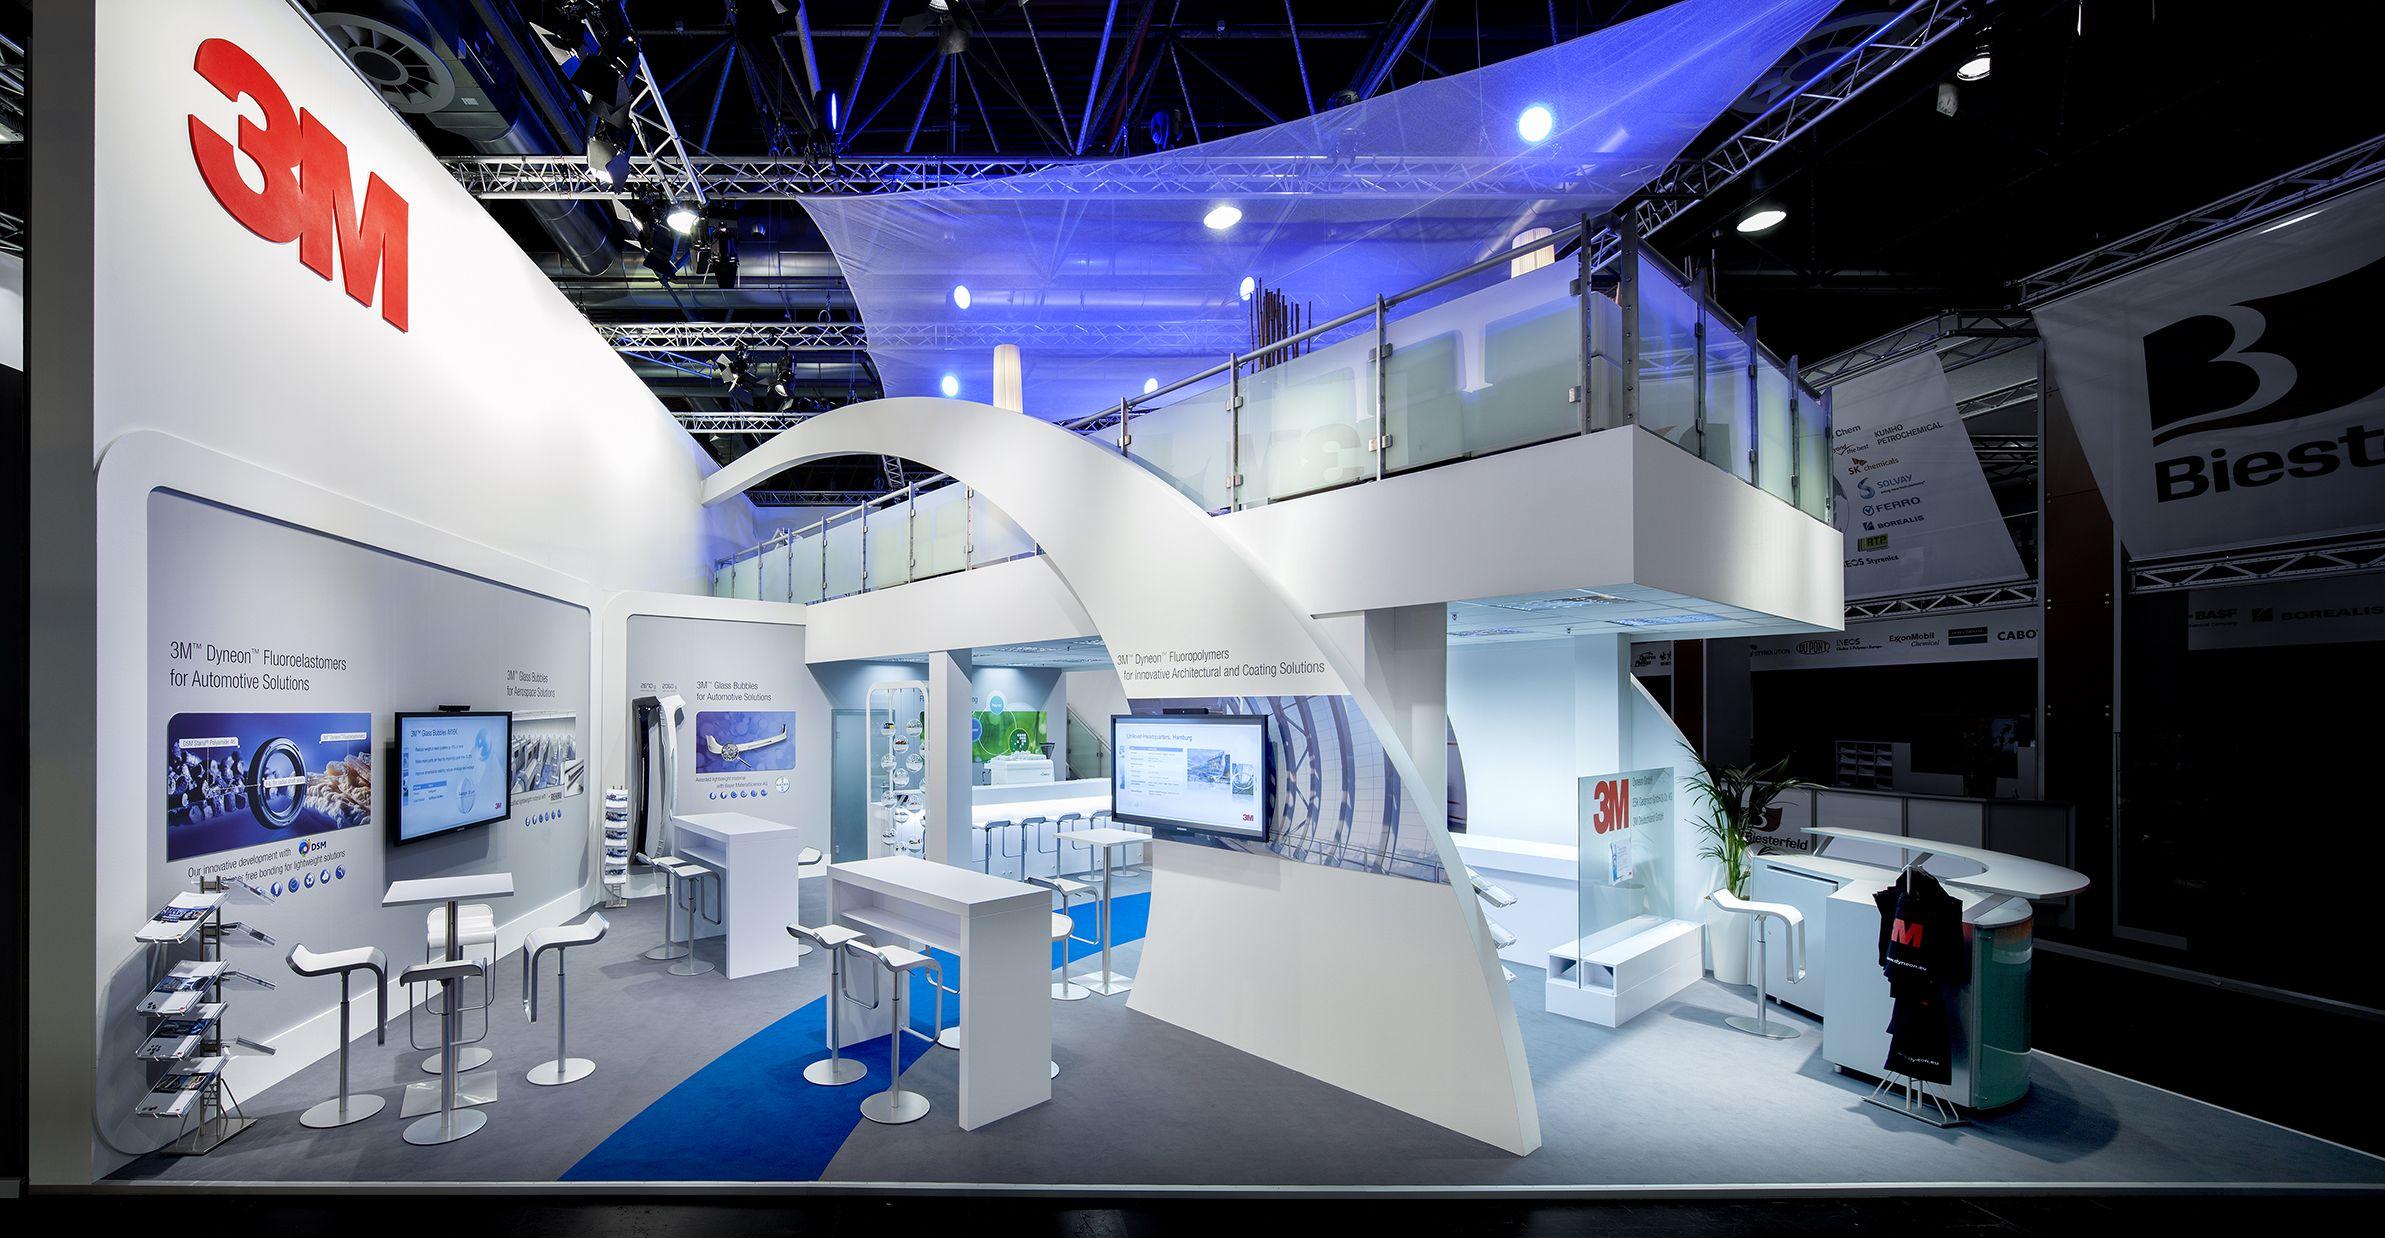 3M at K Trade Fair - International Trade Fair for Plastics and Rubber, Düsseldorf